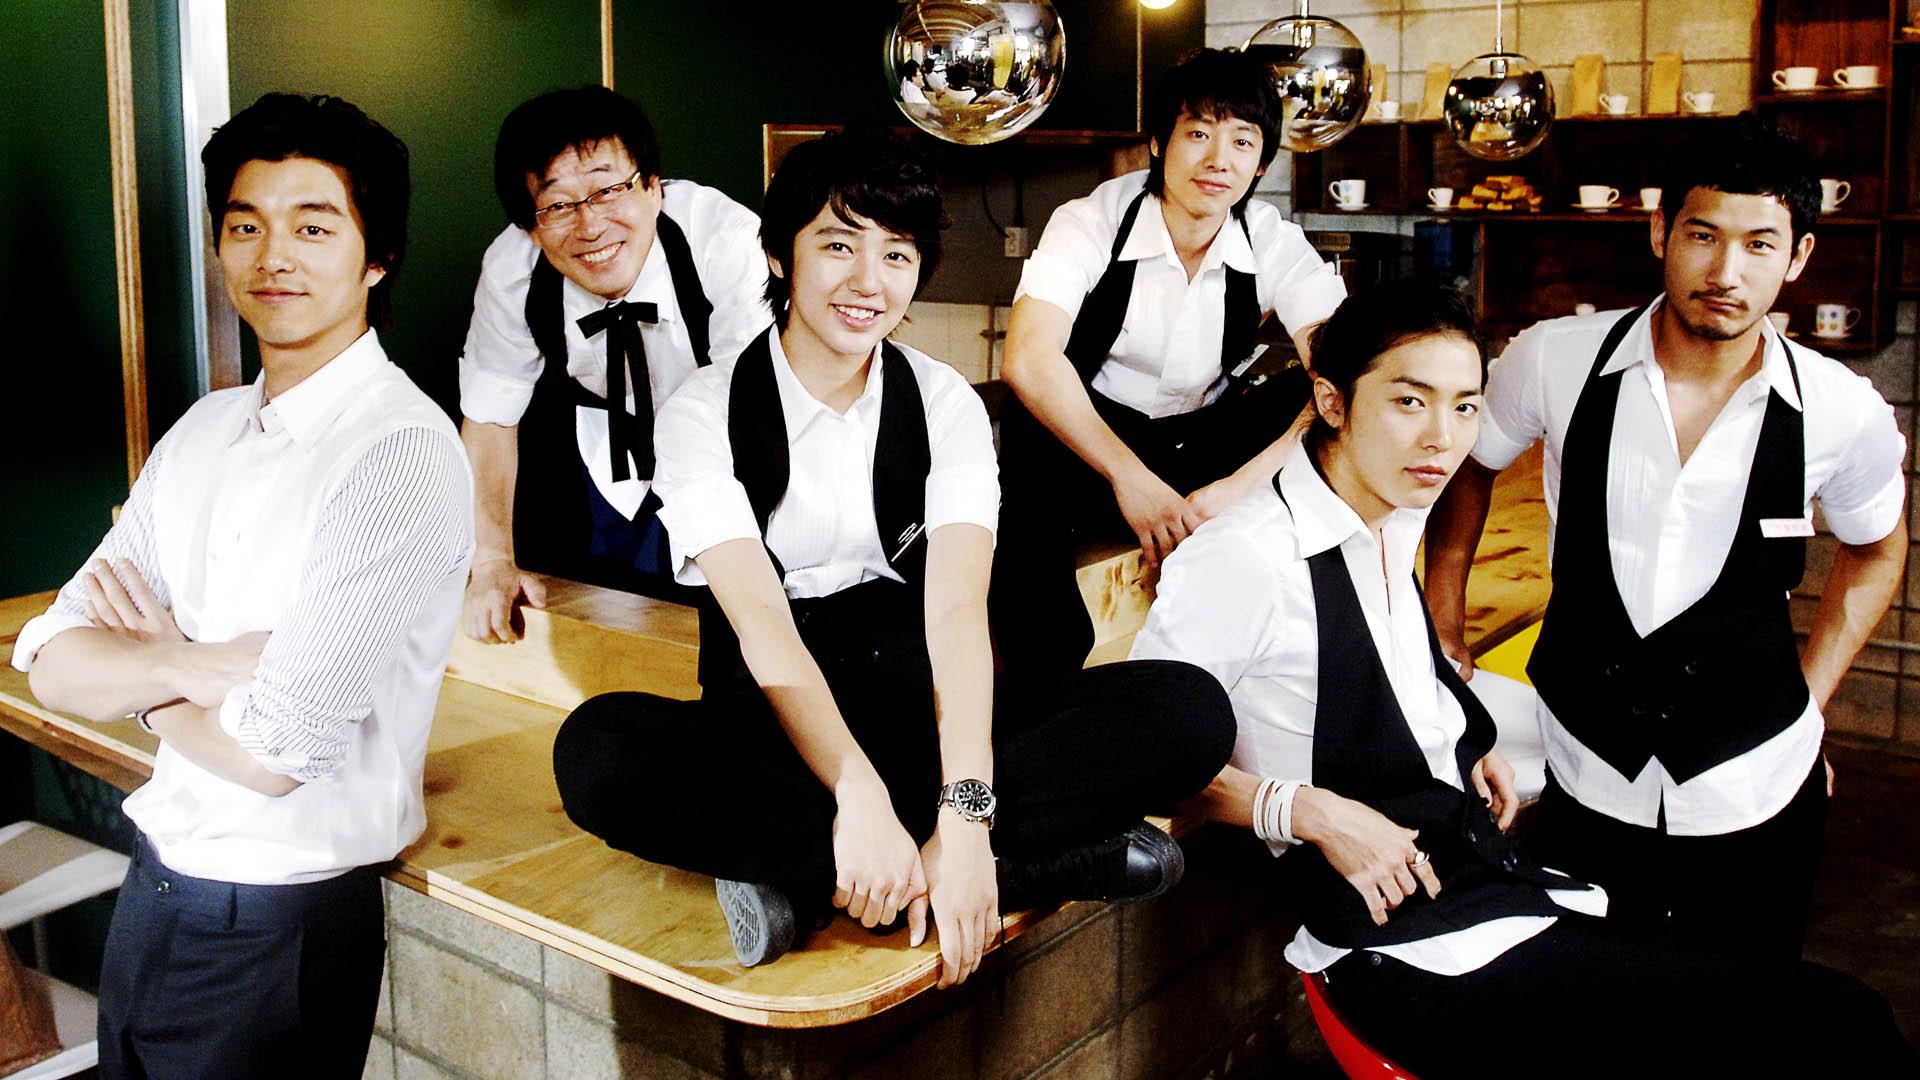 Picture: Fanpop